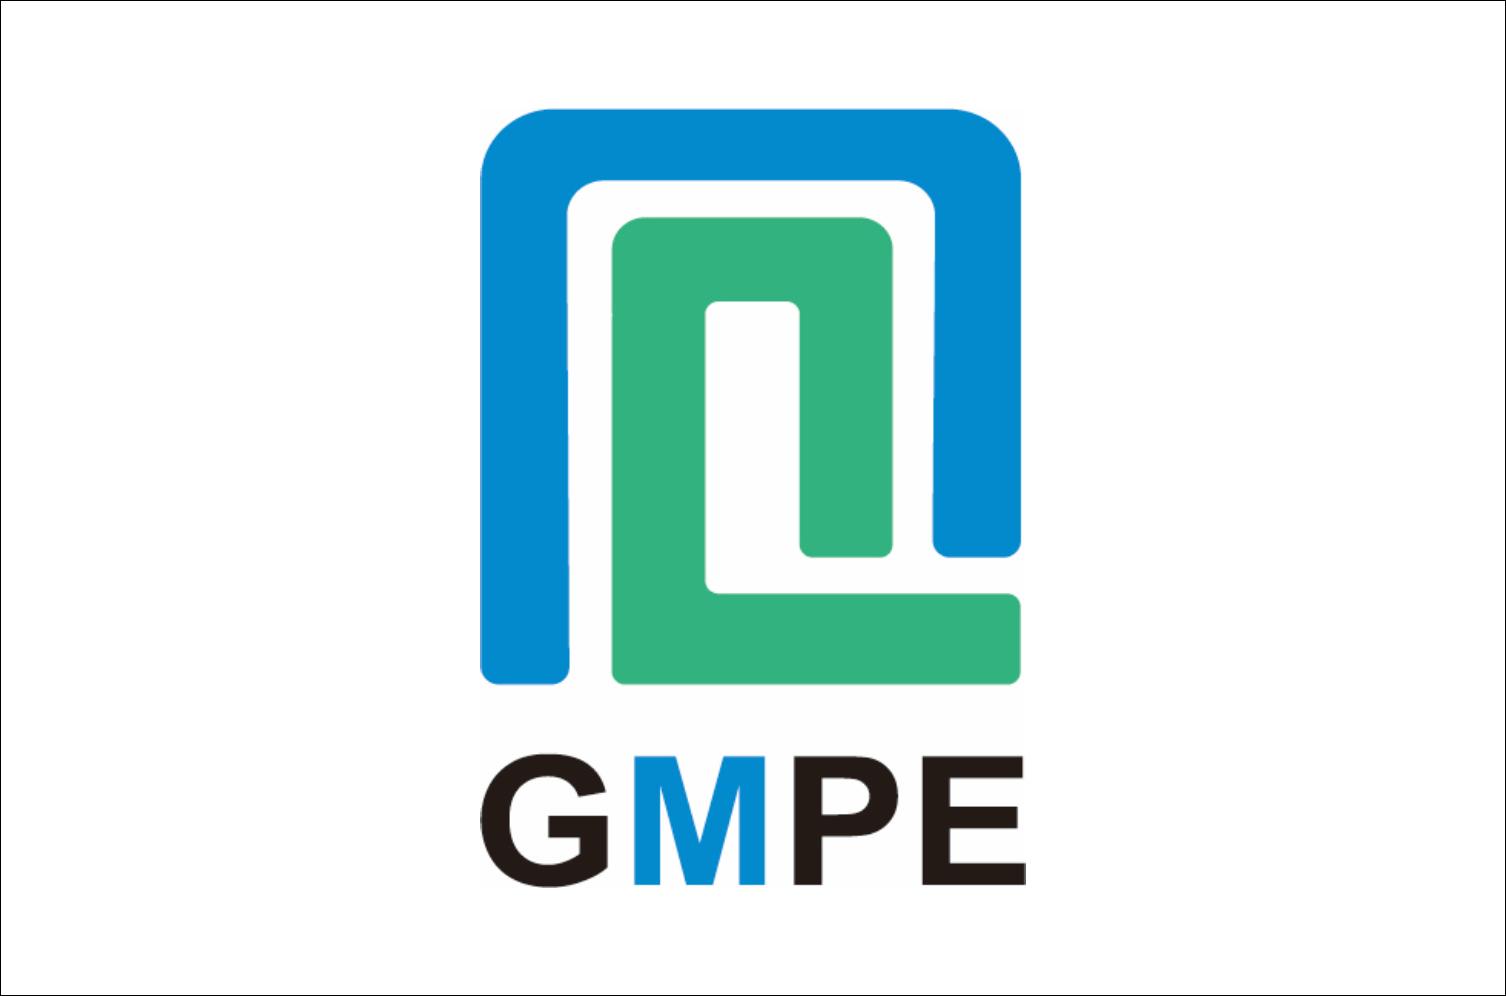 GMPE Corporation